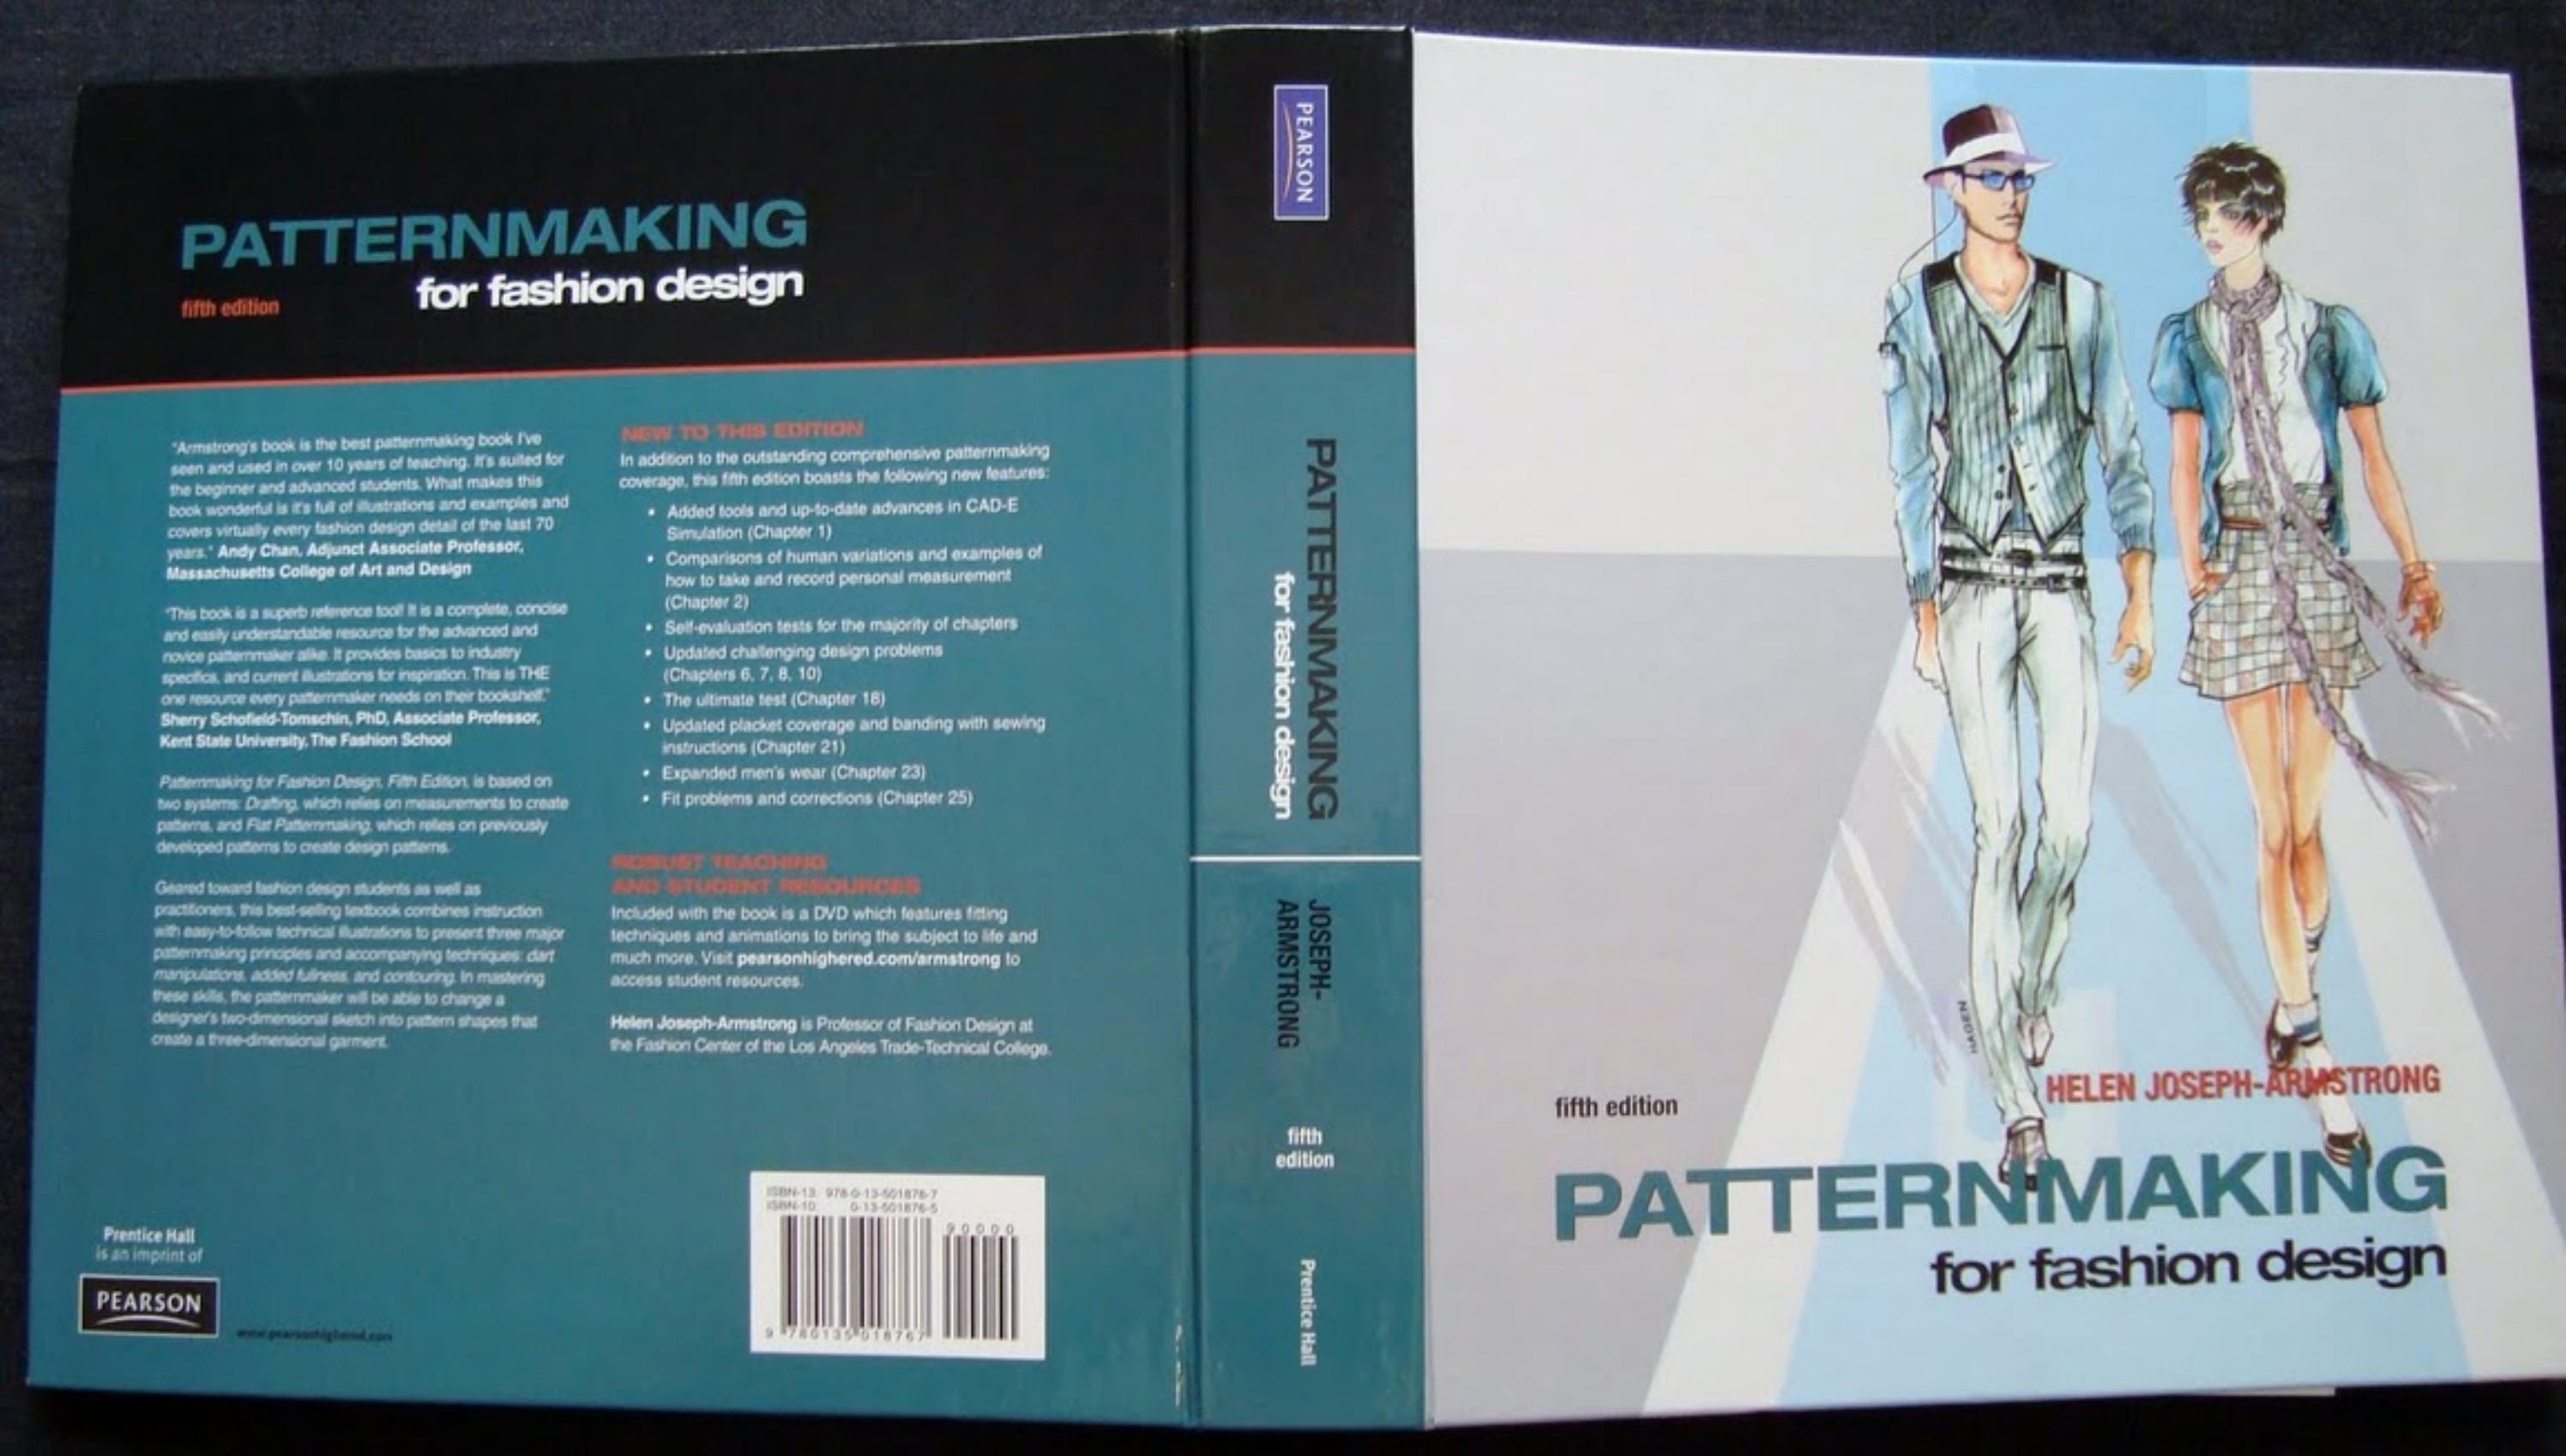 PATTERNMAKING FOR FASHION DESIGN EBOOK DOWNLOAD